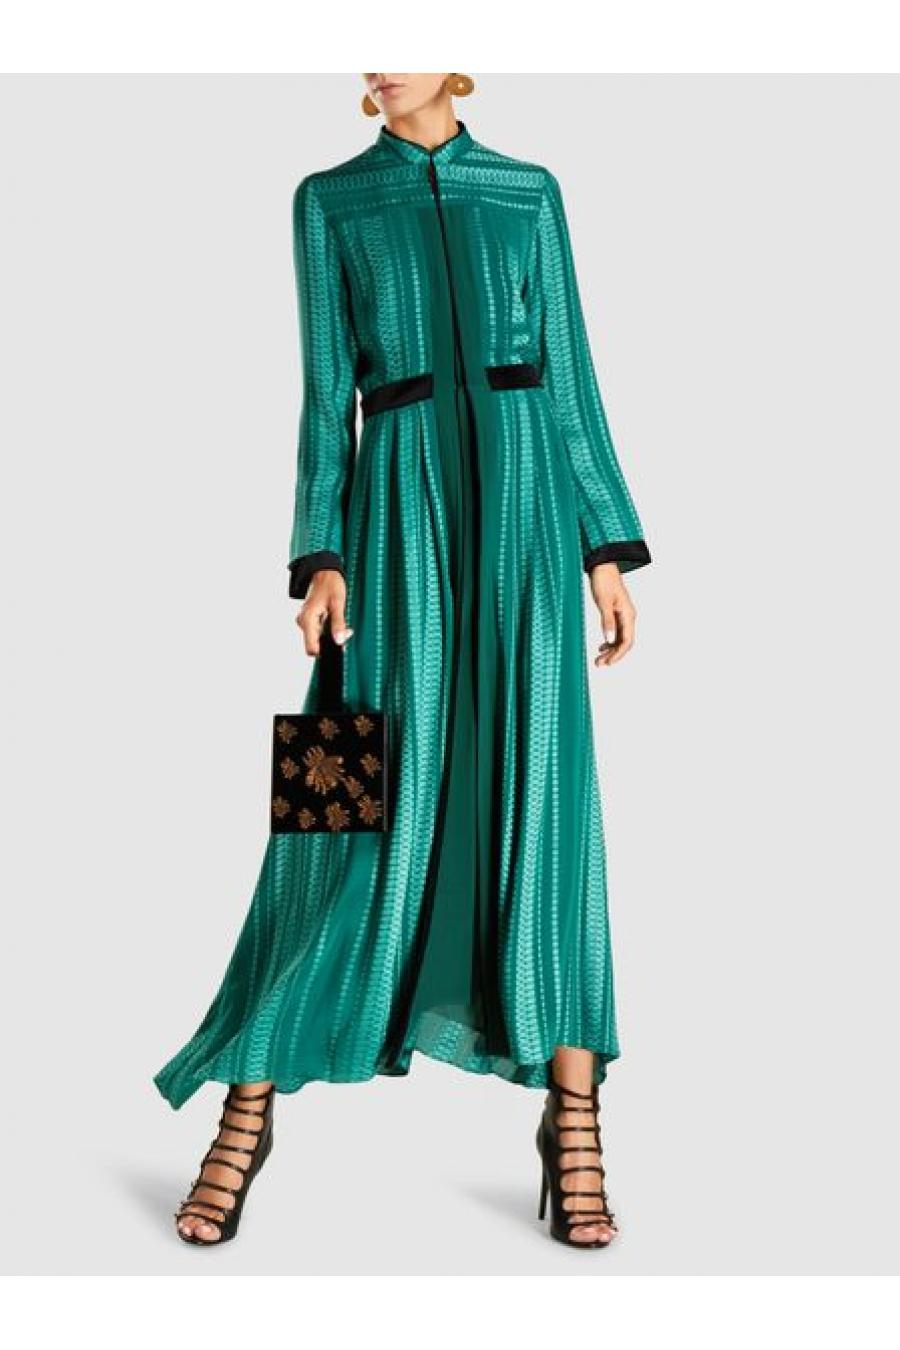 Atlantis Silk-Blend Jacquard Maxi Dress